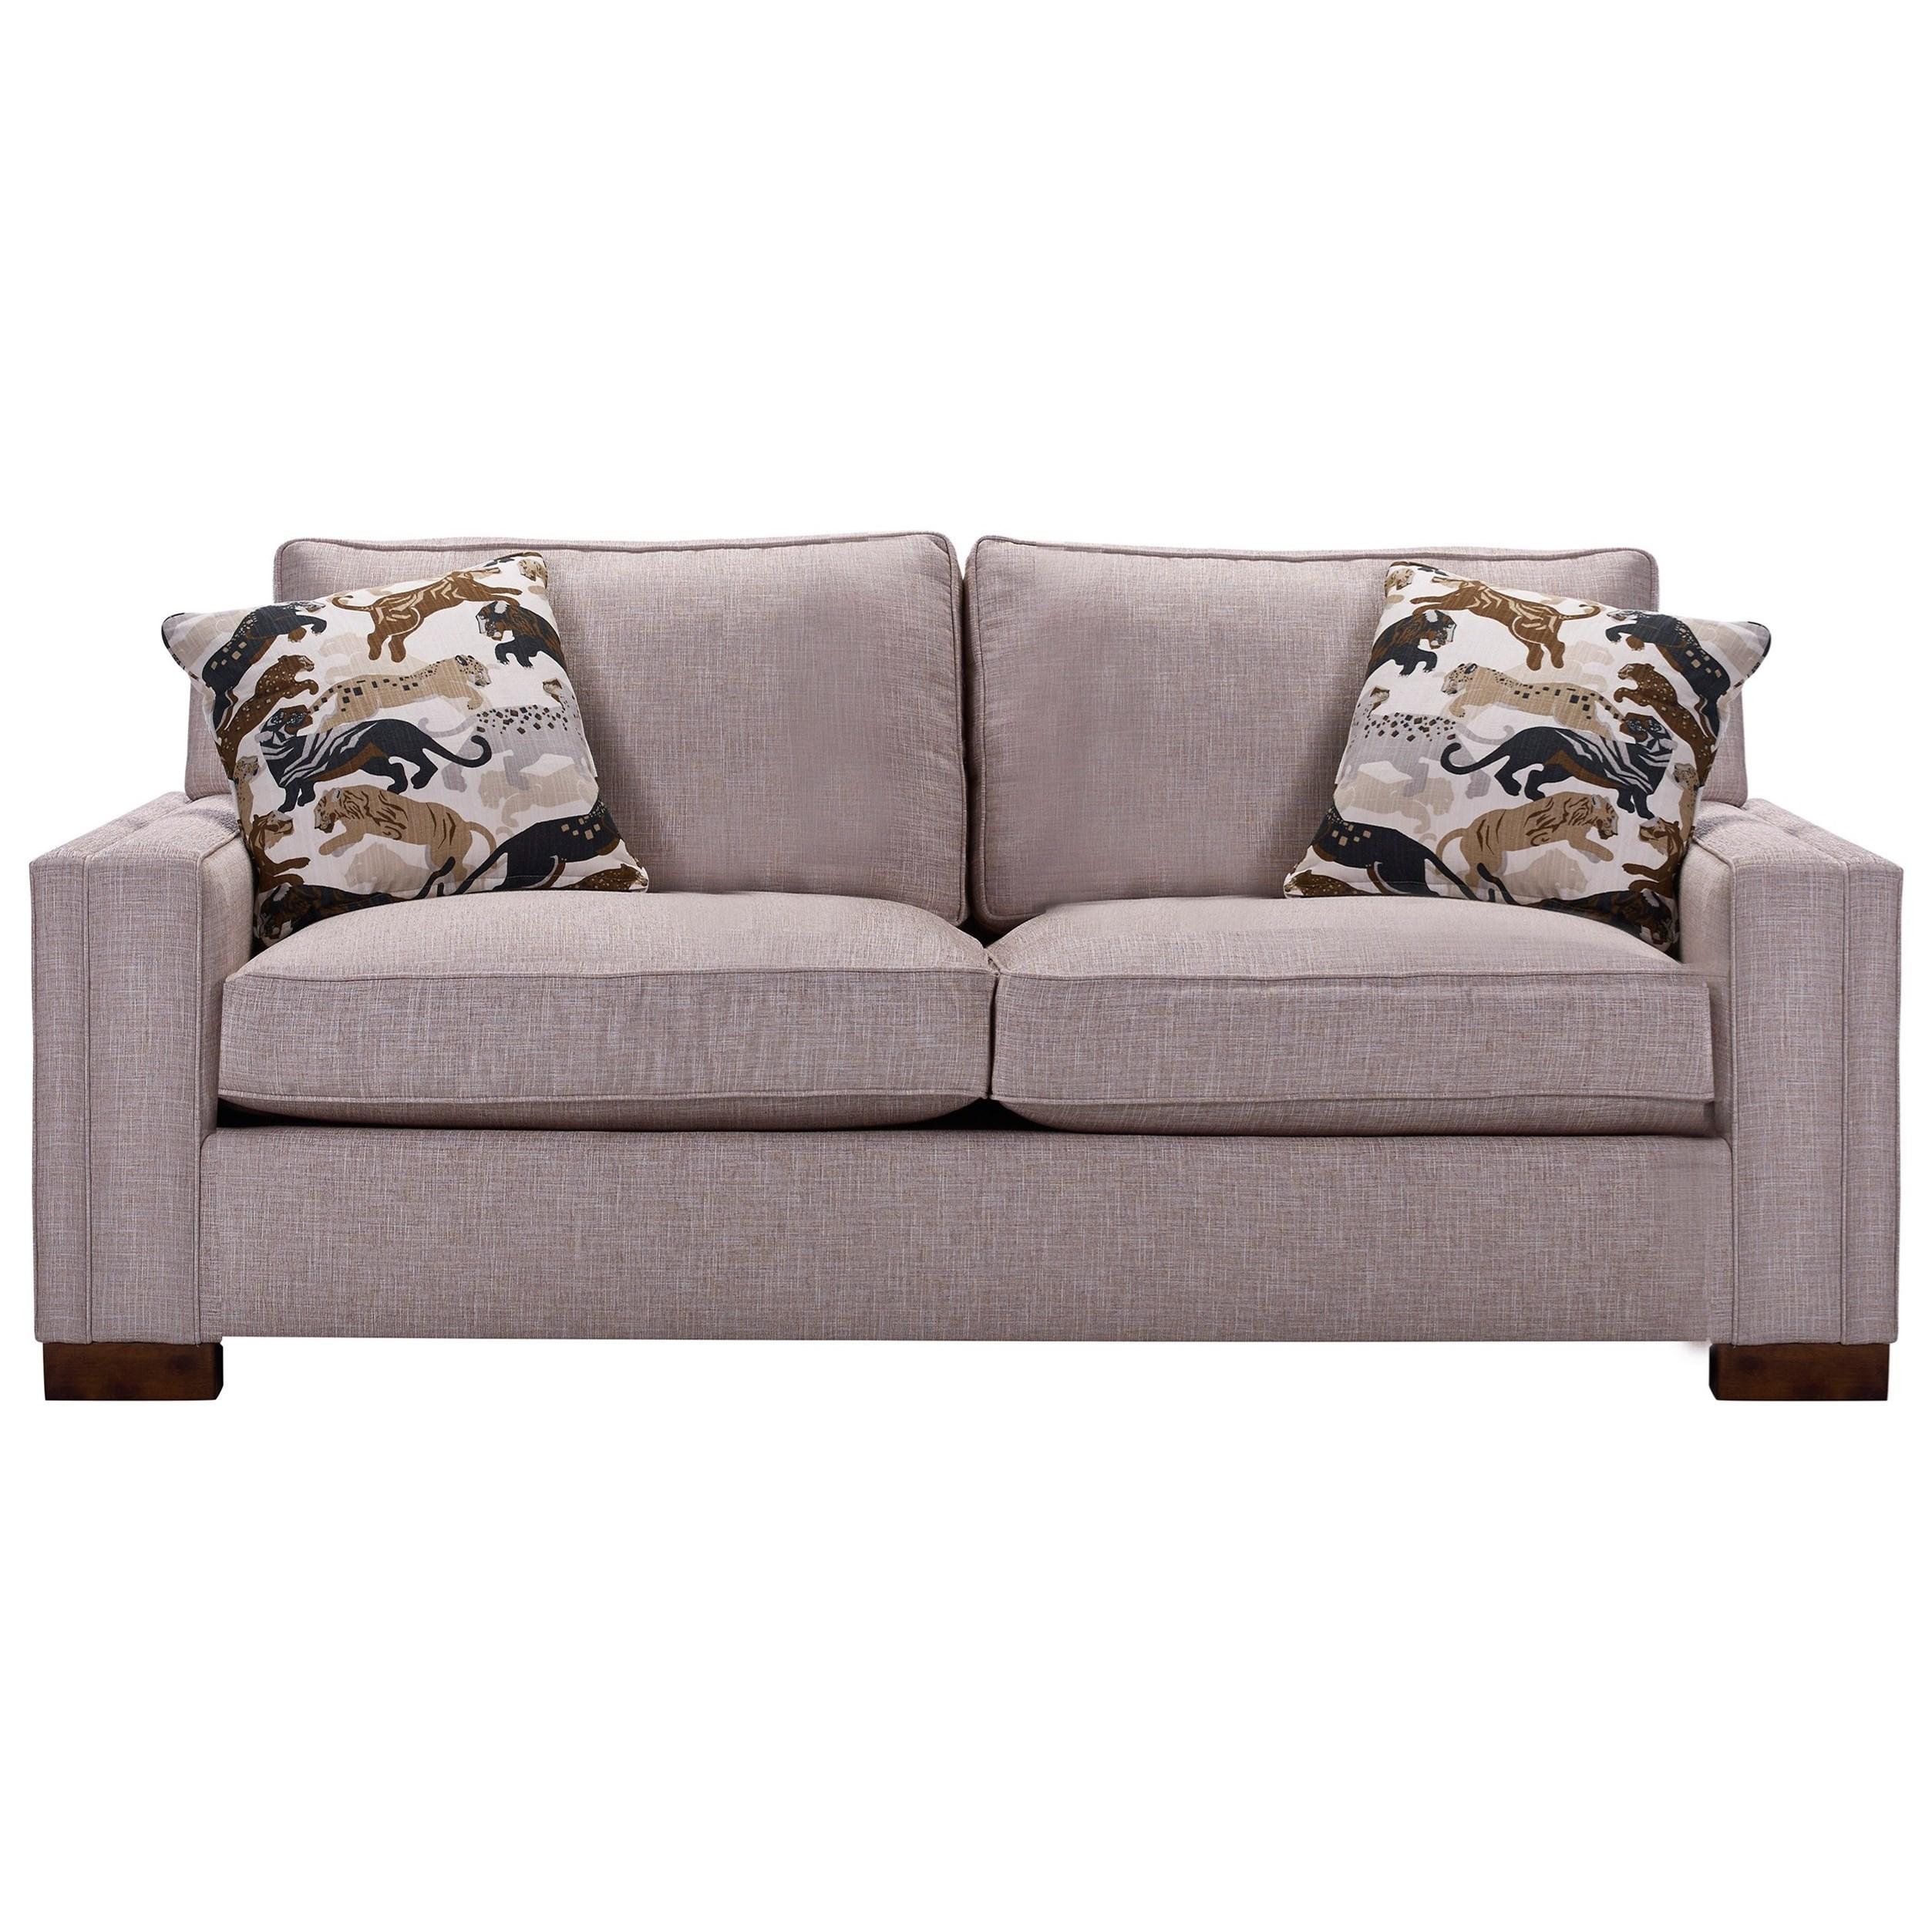 Broyhill Furniture Rocco 4280 2 Apartment Sofa With Sleek Track Arms John V Schultz Furniture